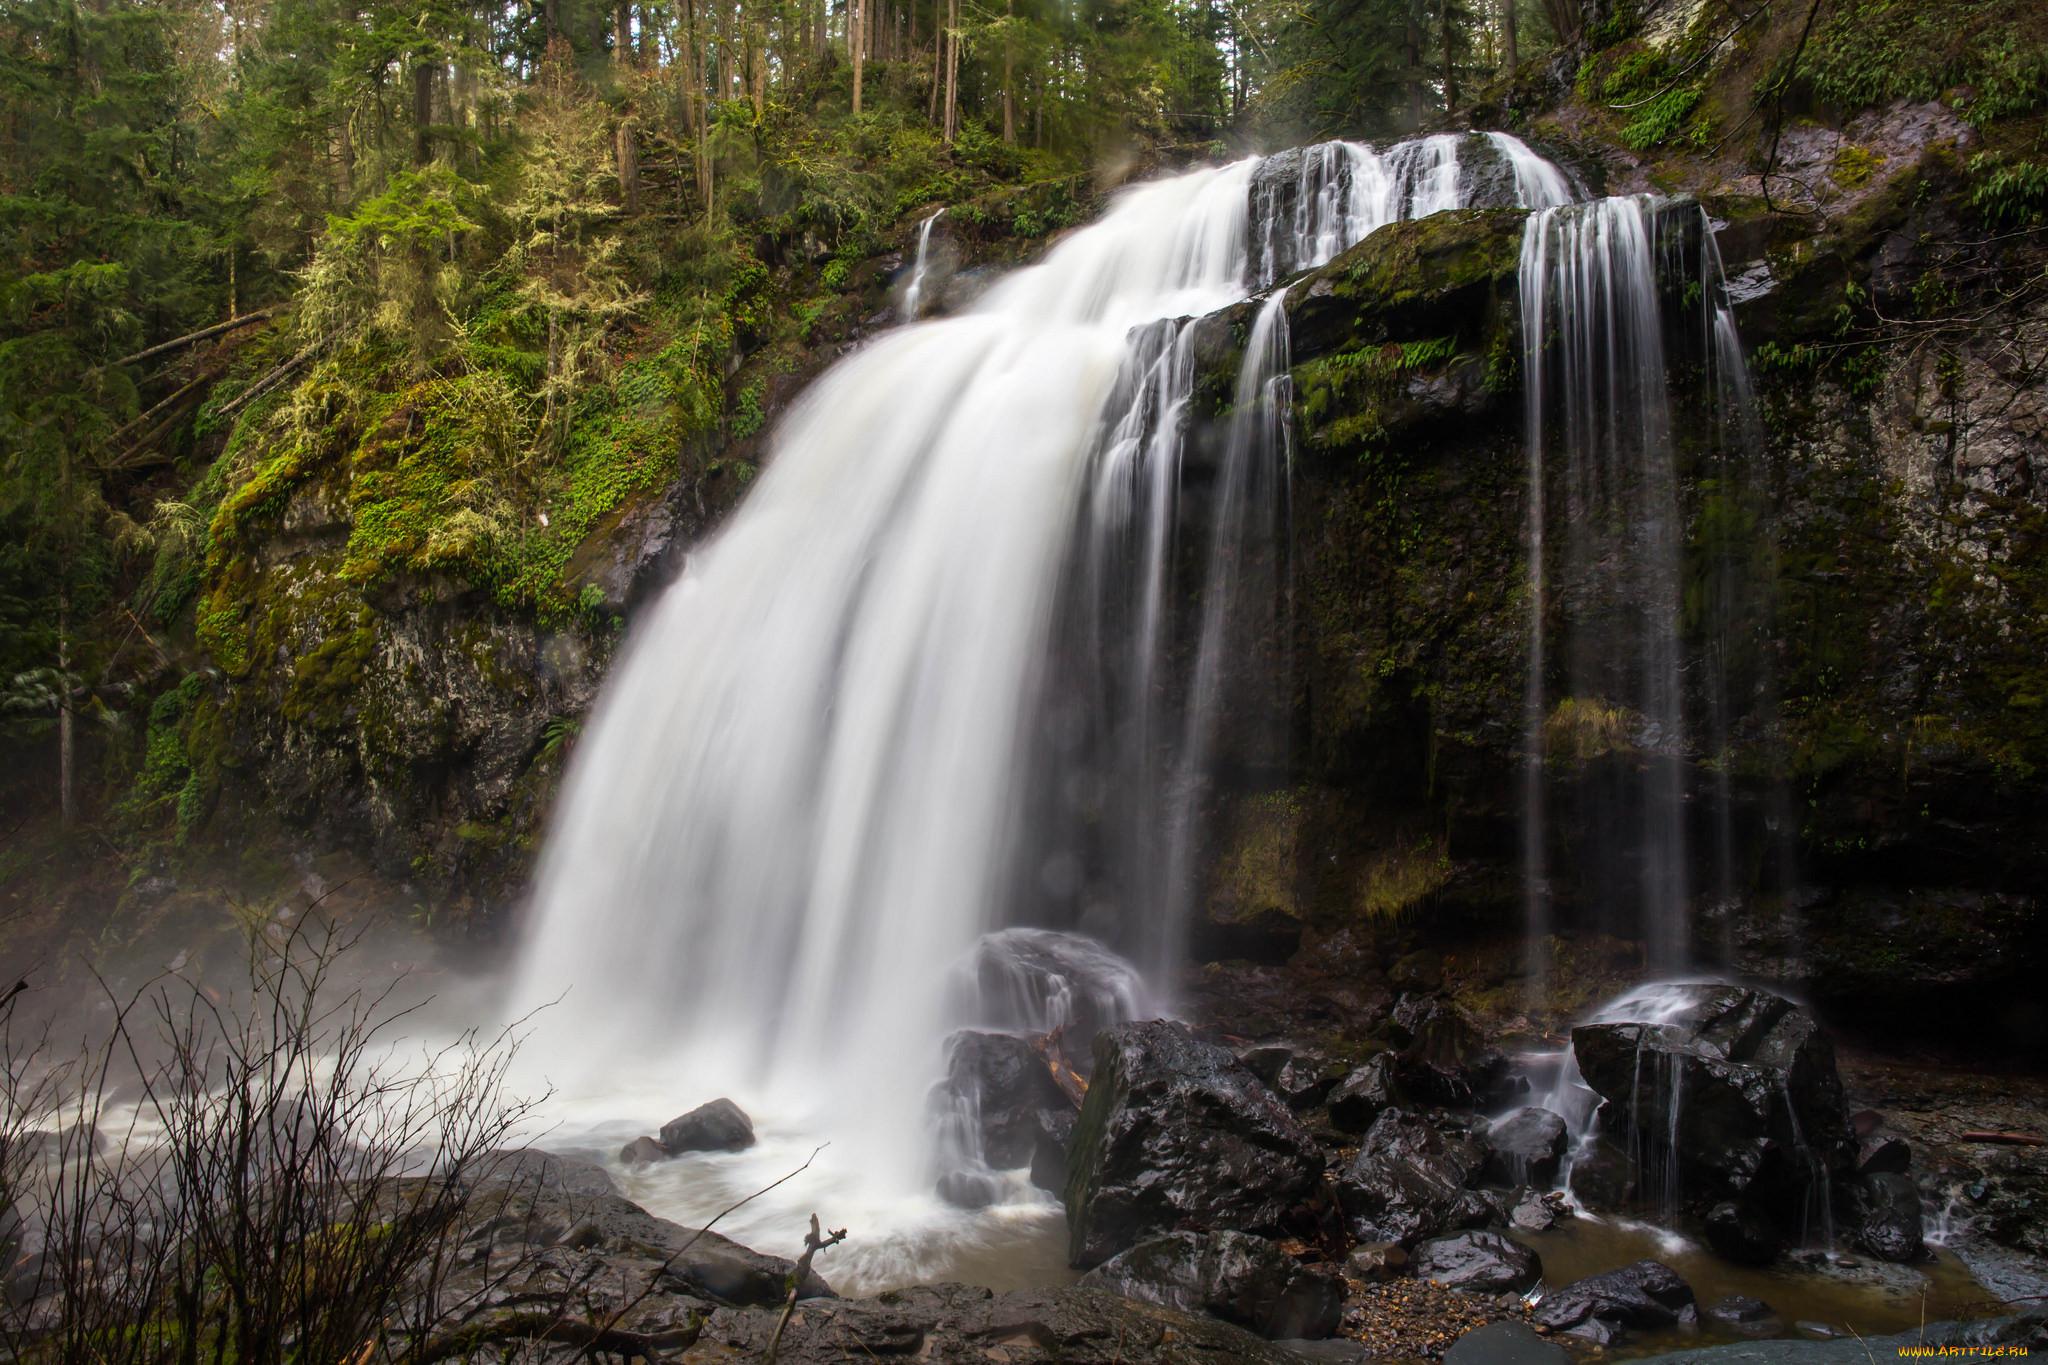 динмонт советские водопады картинки как правило, вам